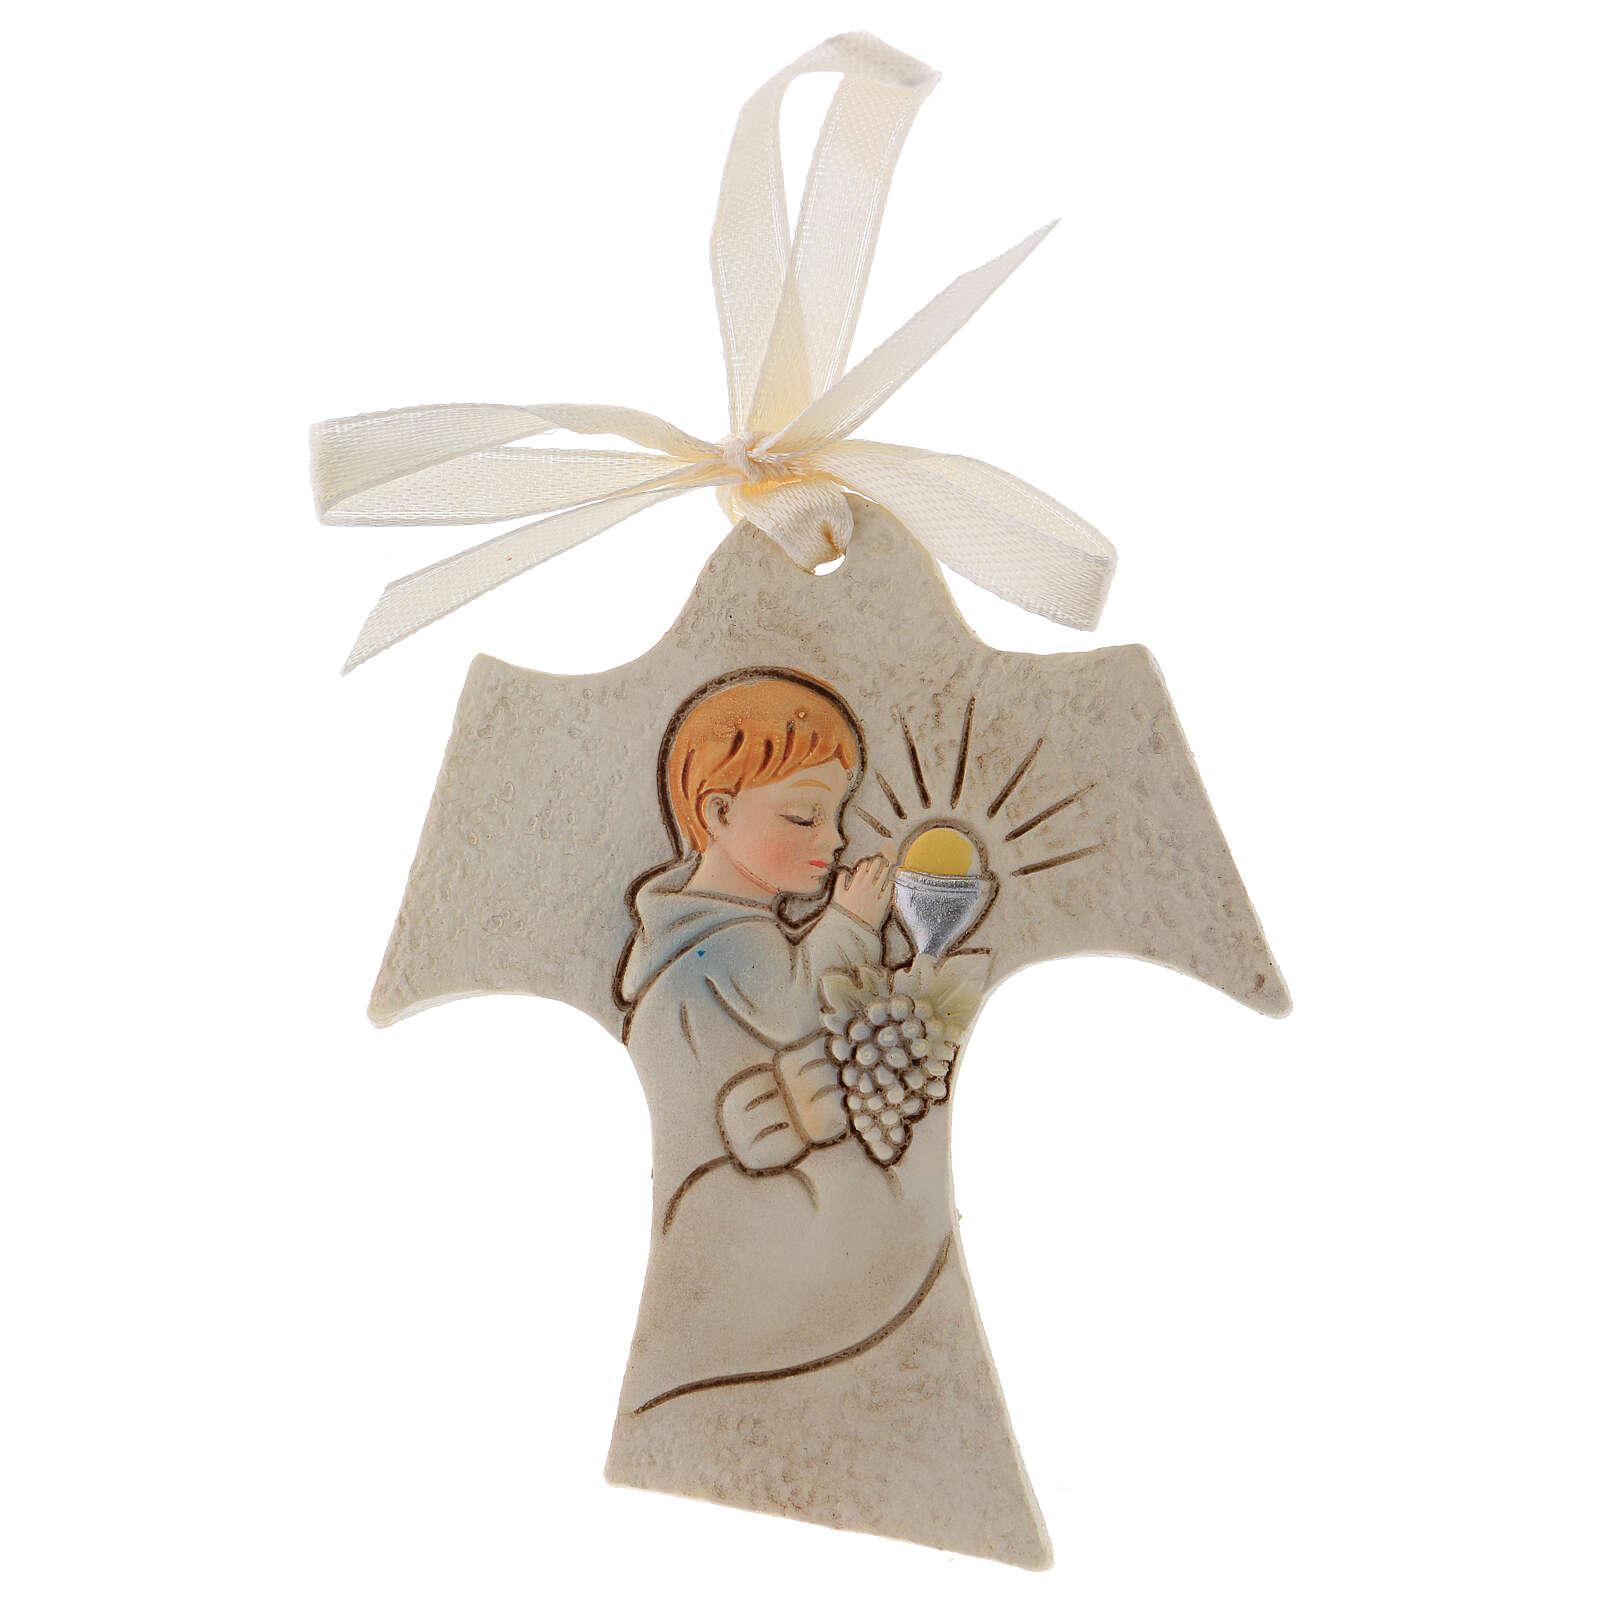 Tau shaped wall ornament boy praying 3 in resin 3